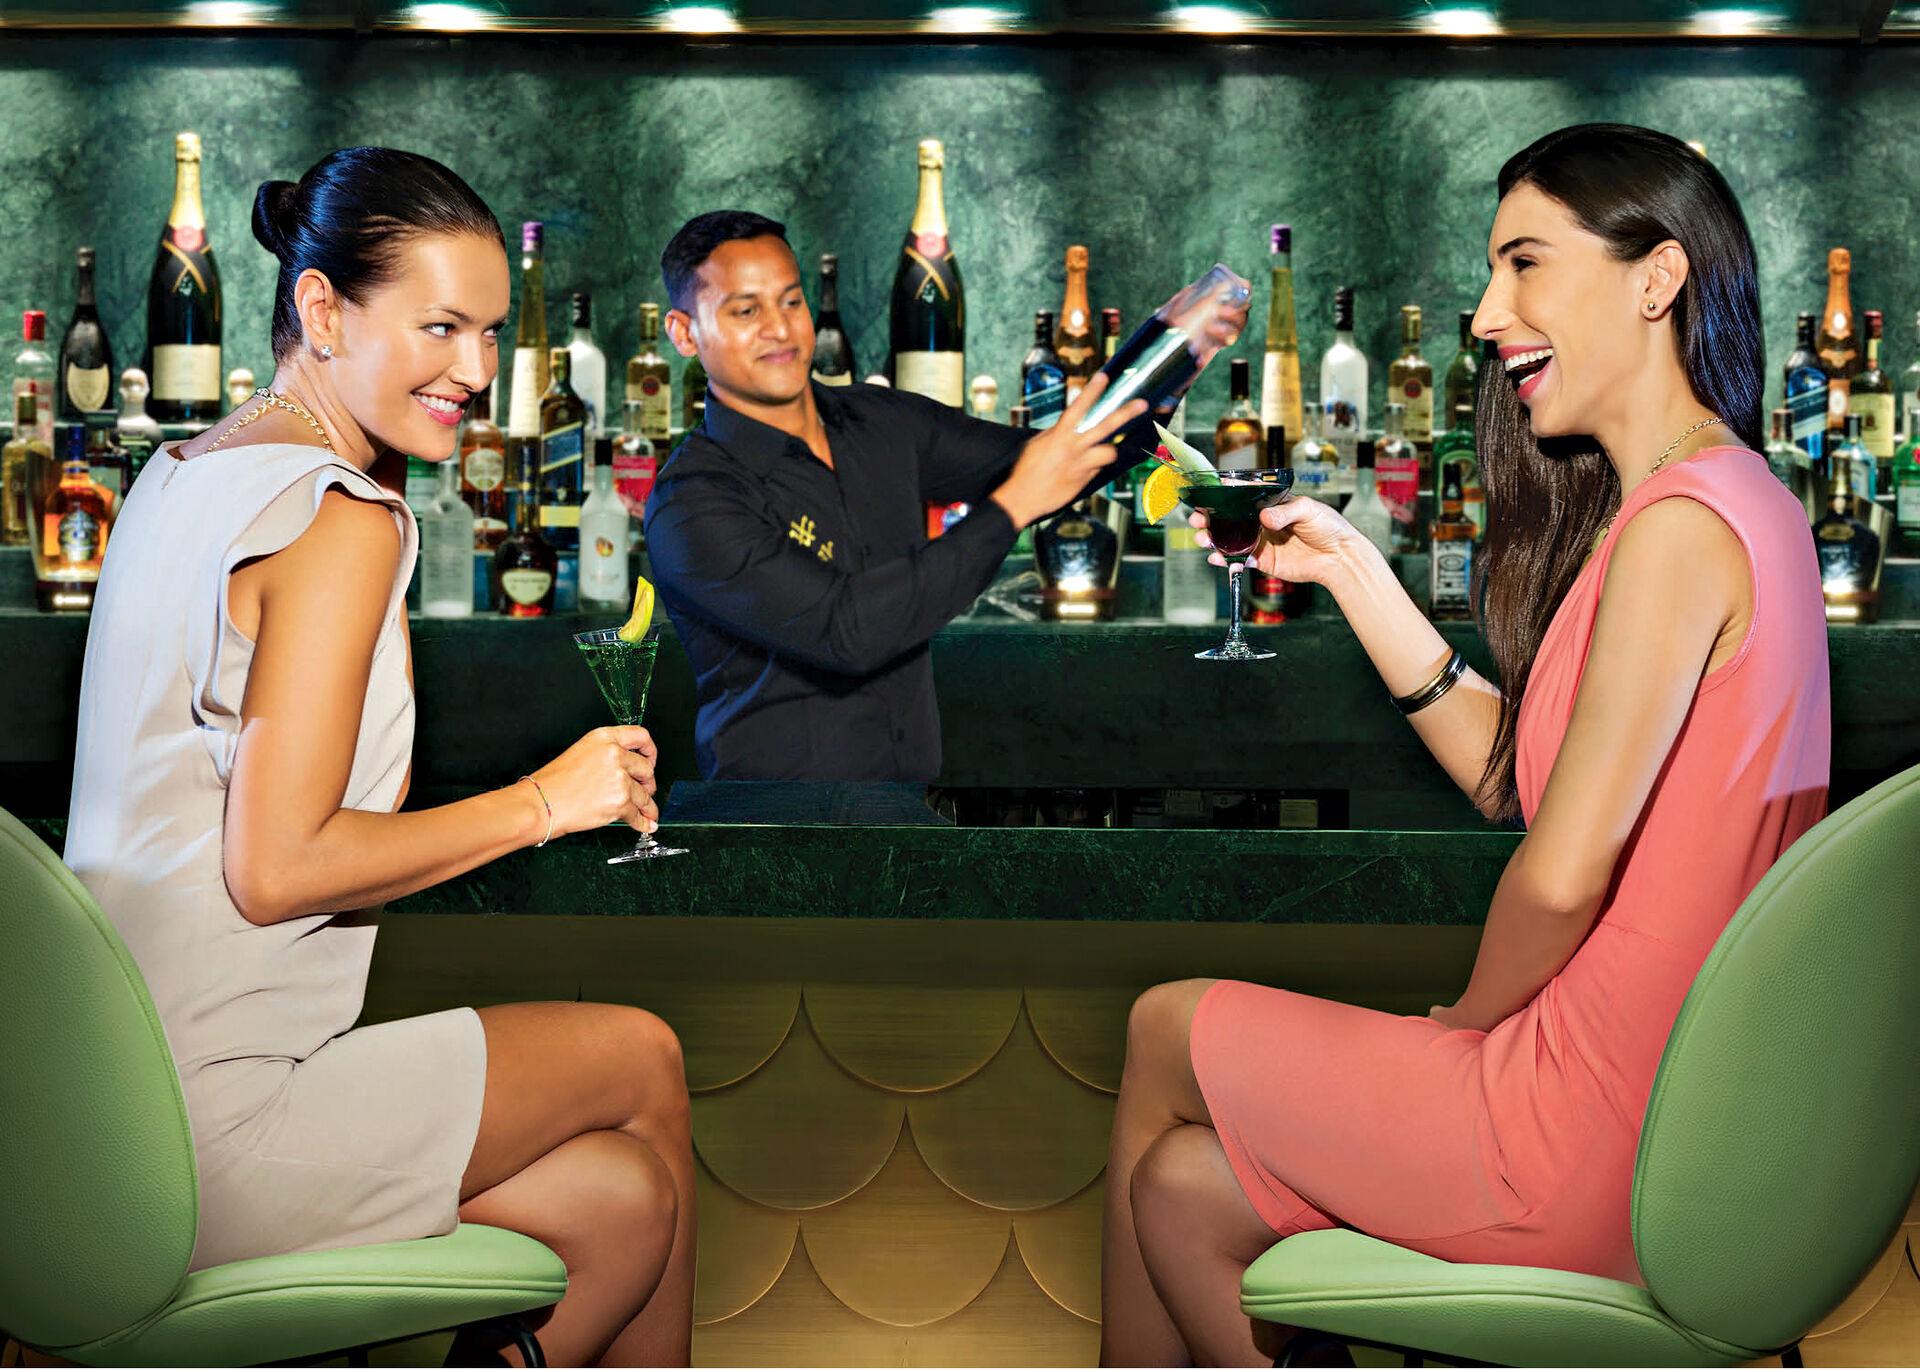 Emirats Arabes Unis - Ras Al Khaimah - Hôtel The Bay Club DoubleTree by Hilton Resort & Spa Marjan Island 5*